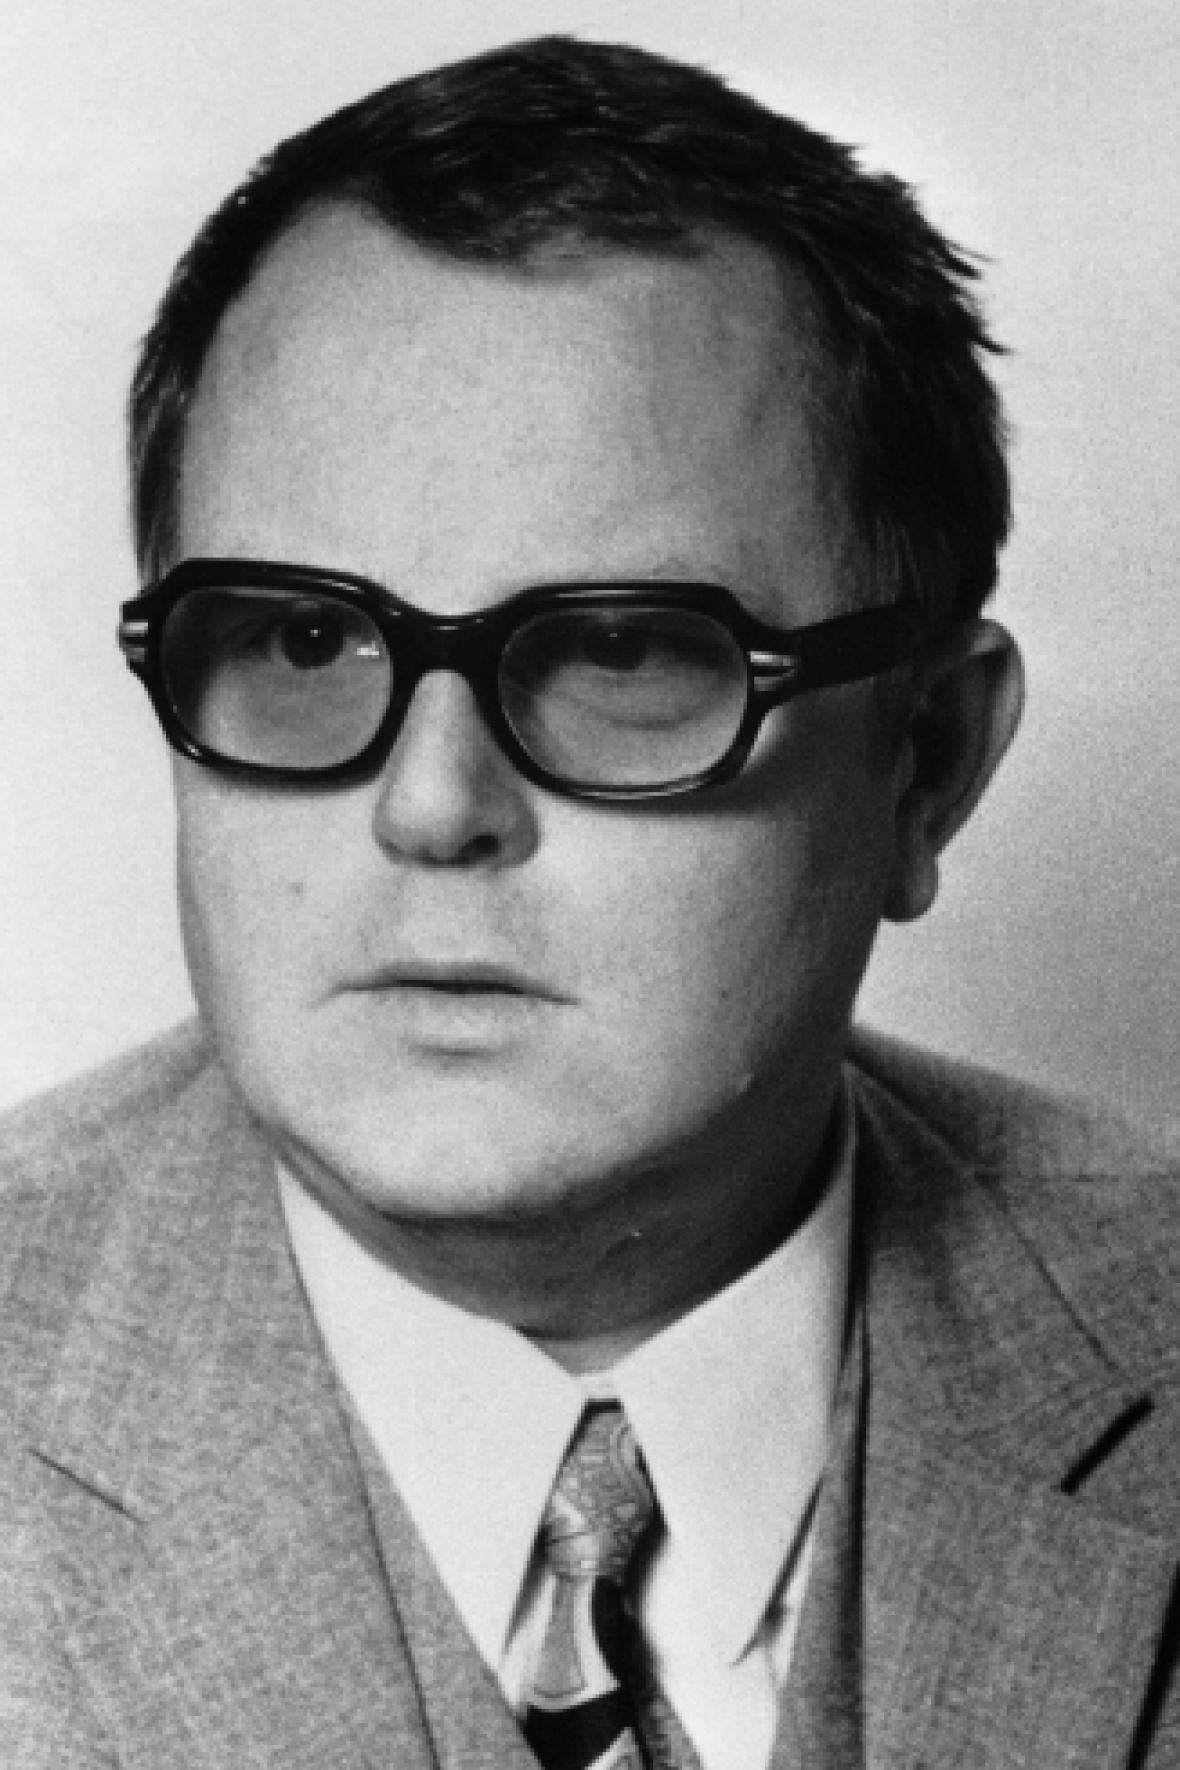 Hansjoachim Tiedge